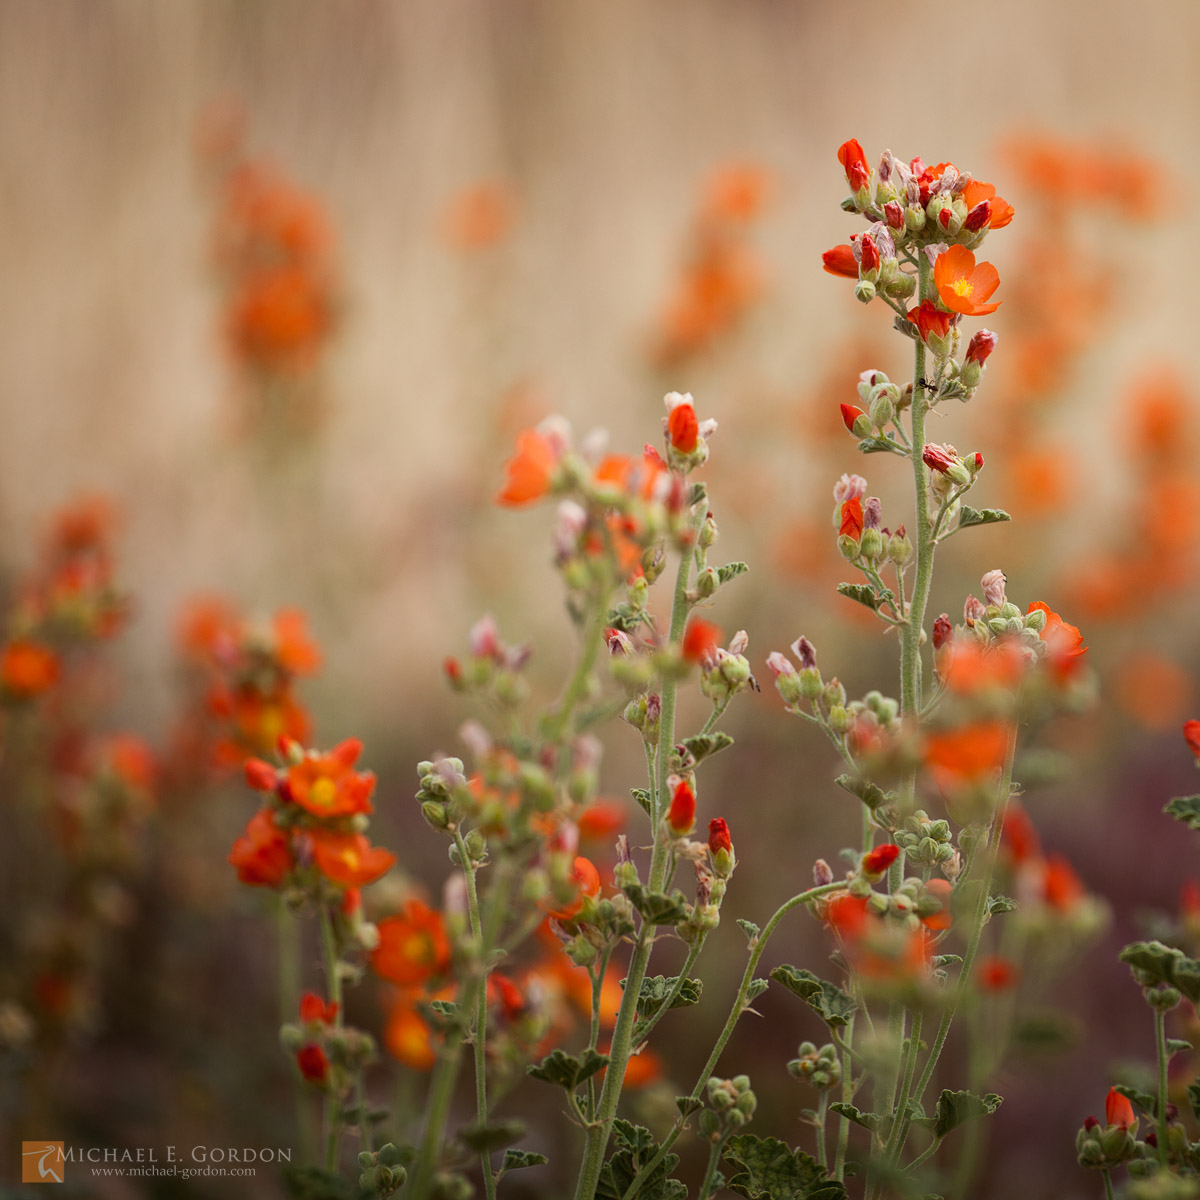 photo,picture,Desert Globemallow,Apricot Globemallow,Sphaeralcea ambigua,wildflowers,bloom,buds,orange,green,Mojave National Preserve,Mojave Desert,California., photo